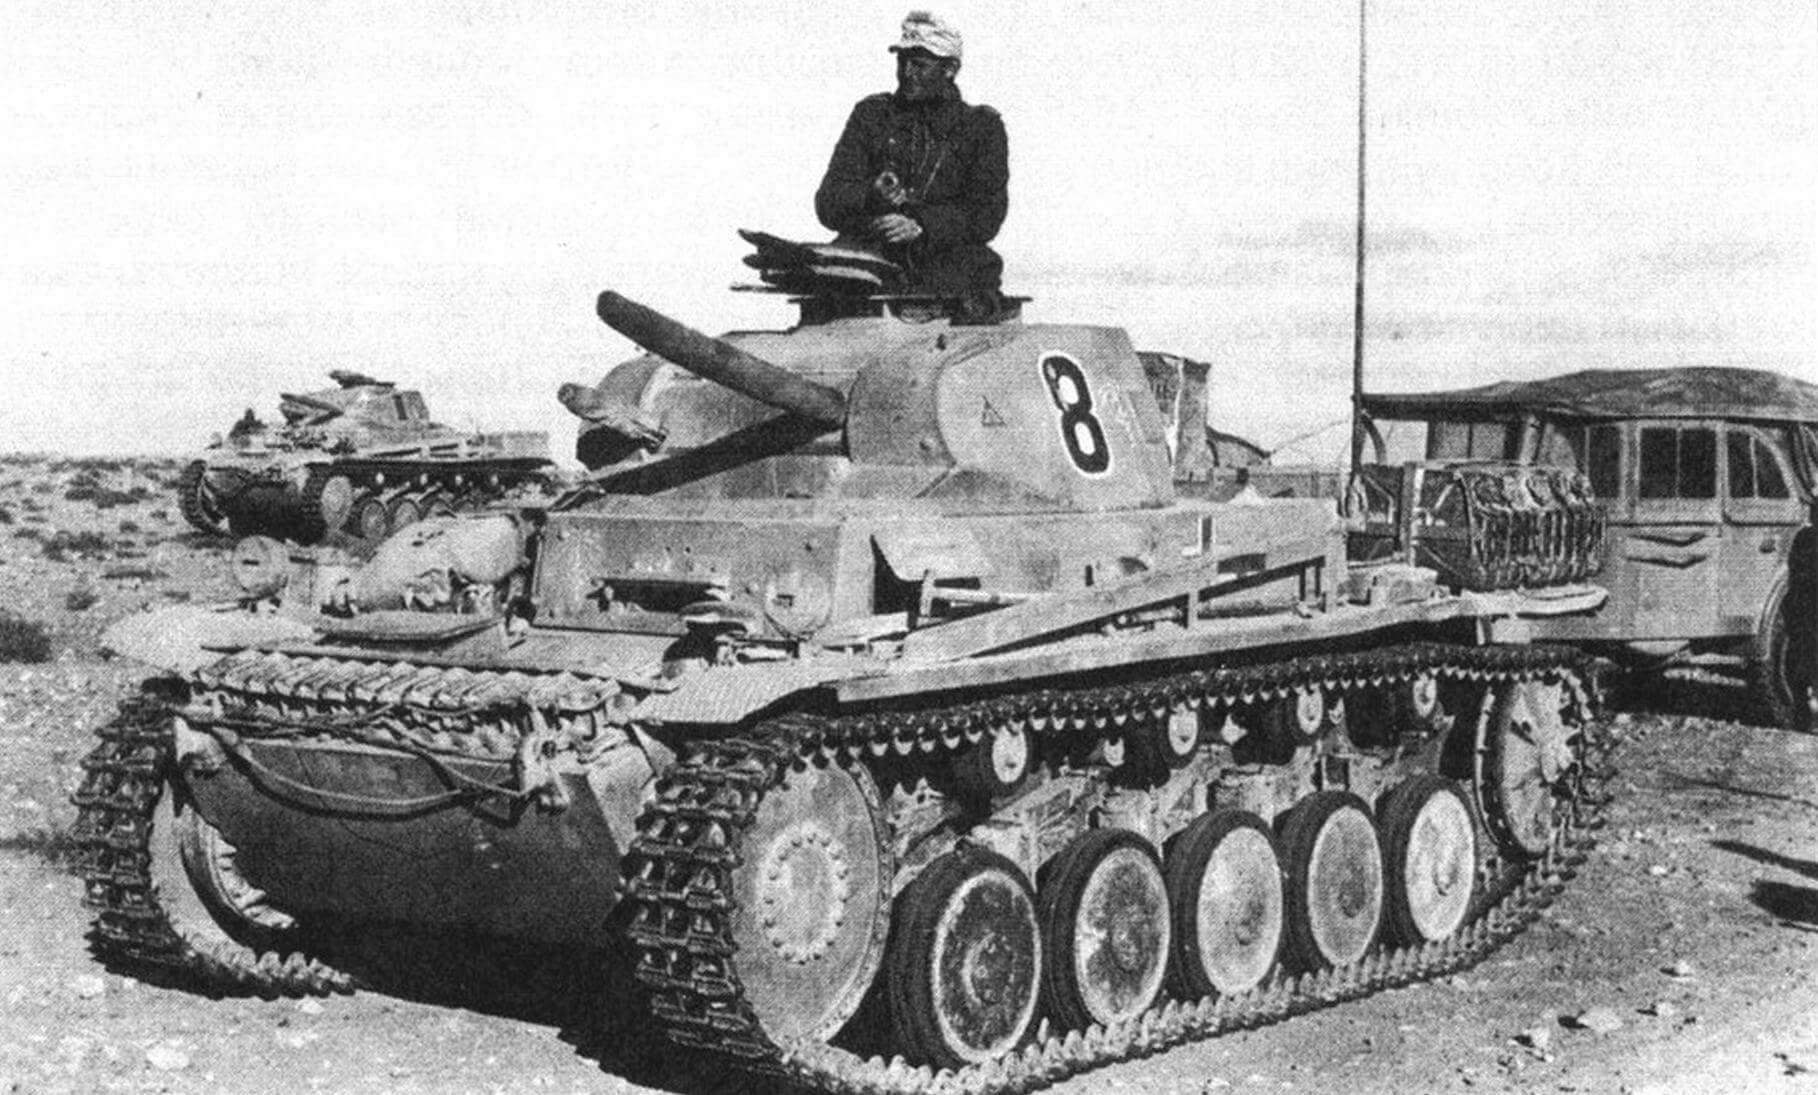 Танки Pz.II Ausf.A - С в Северной Африке. 1941 год